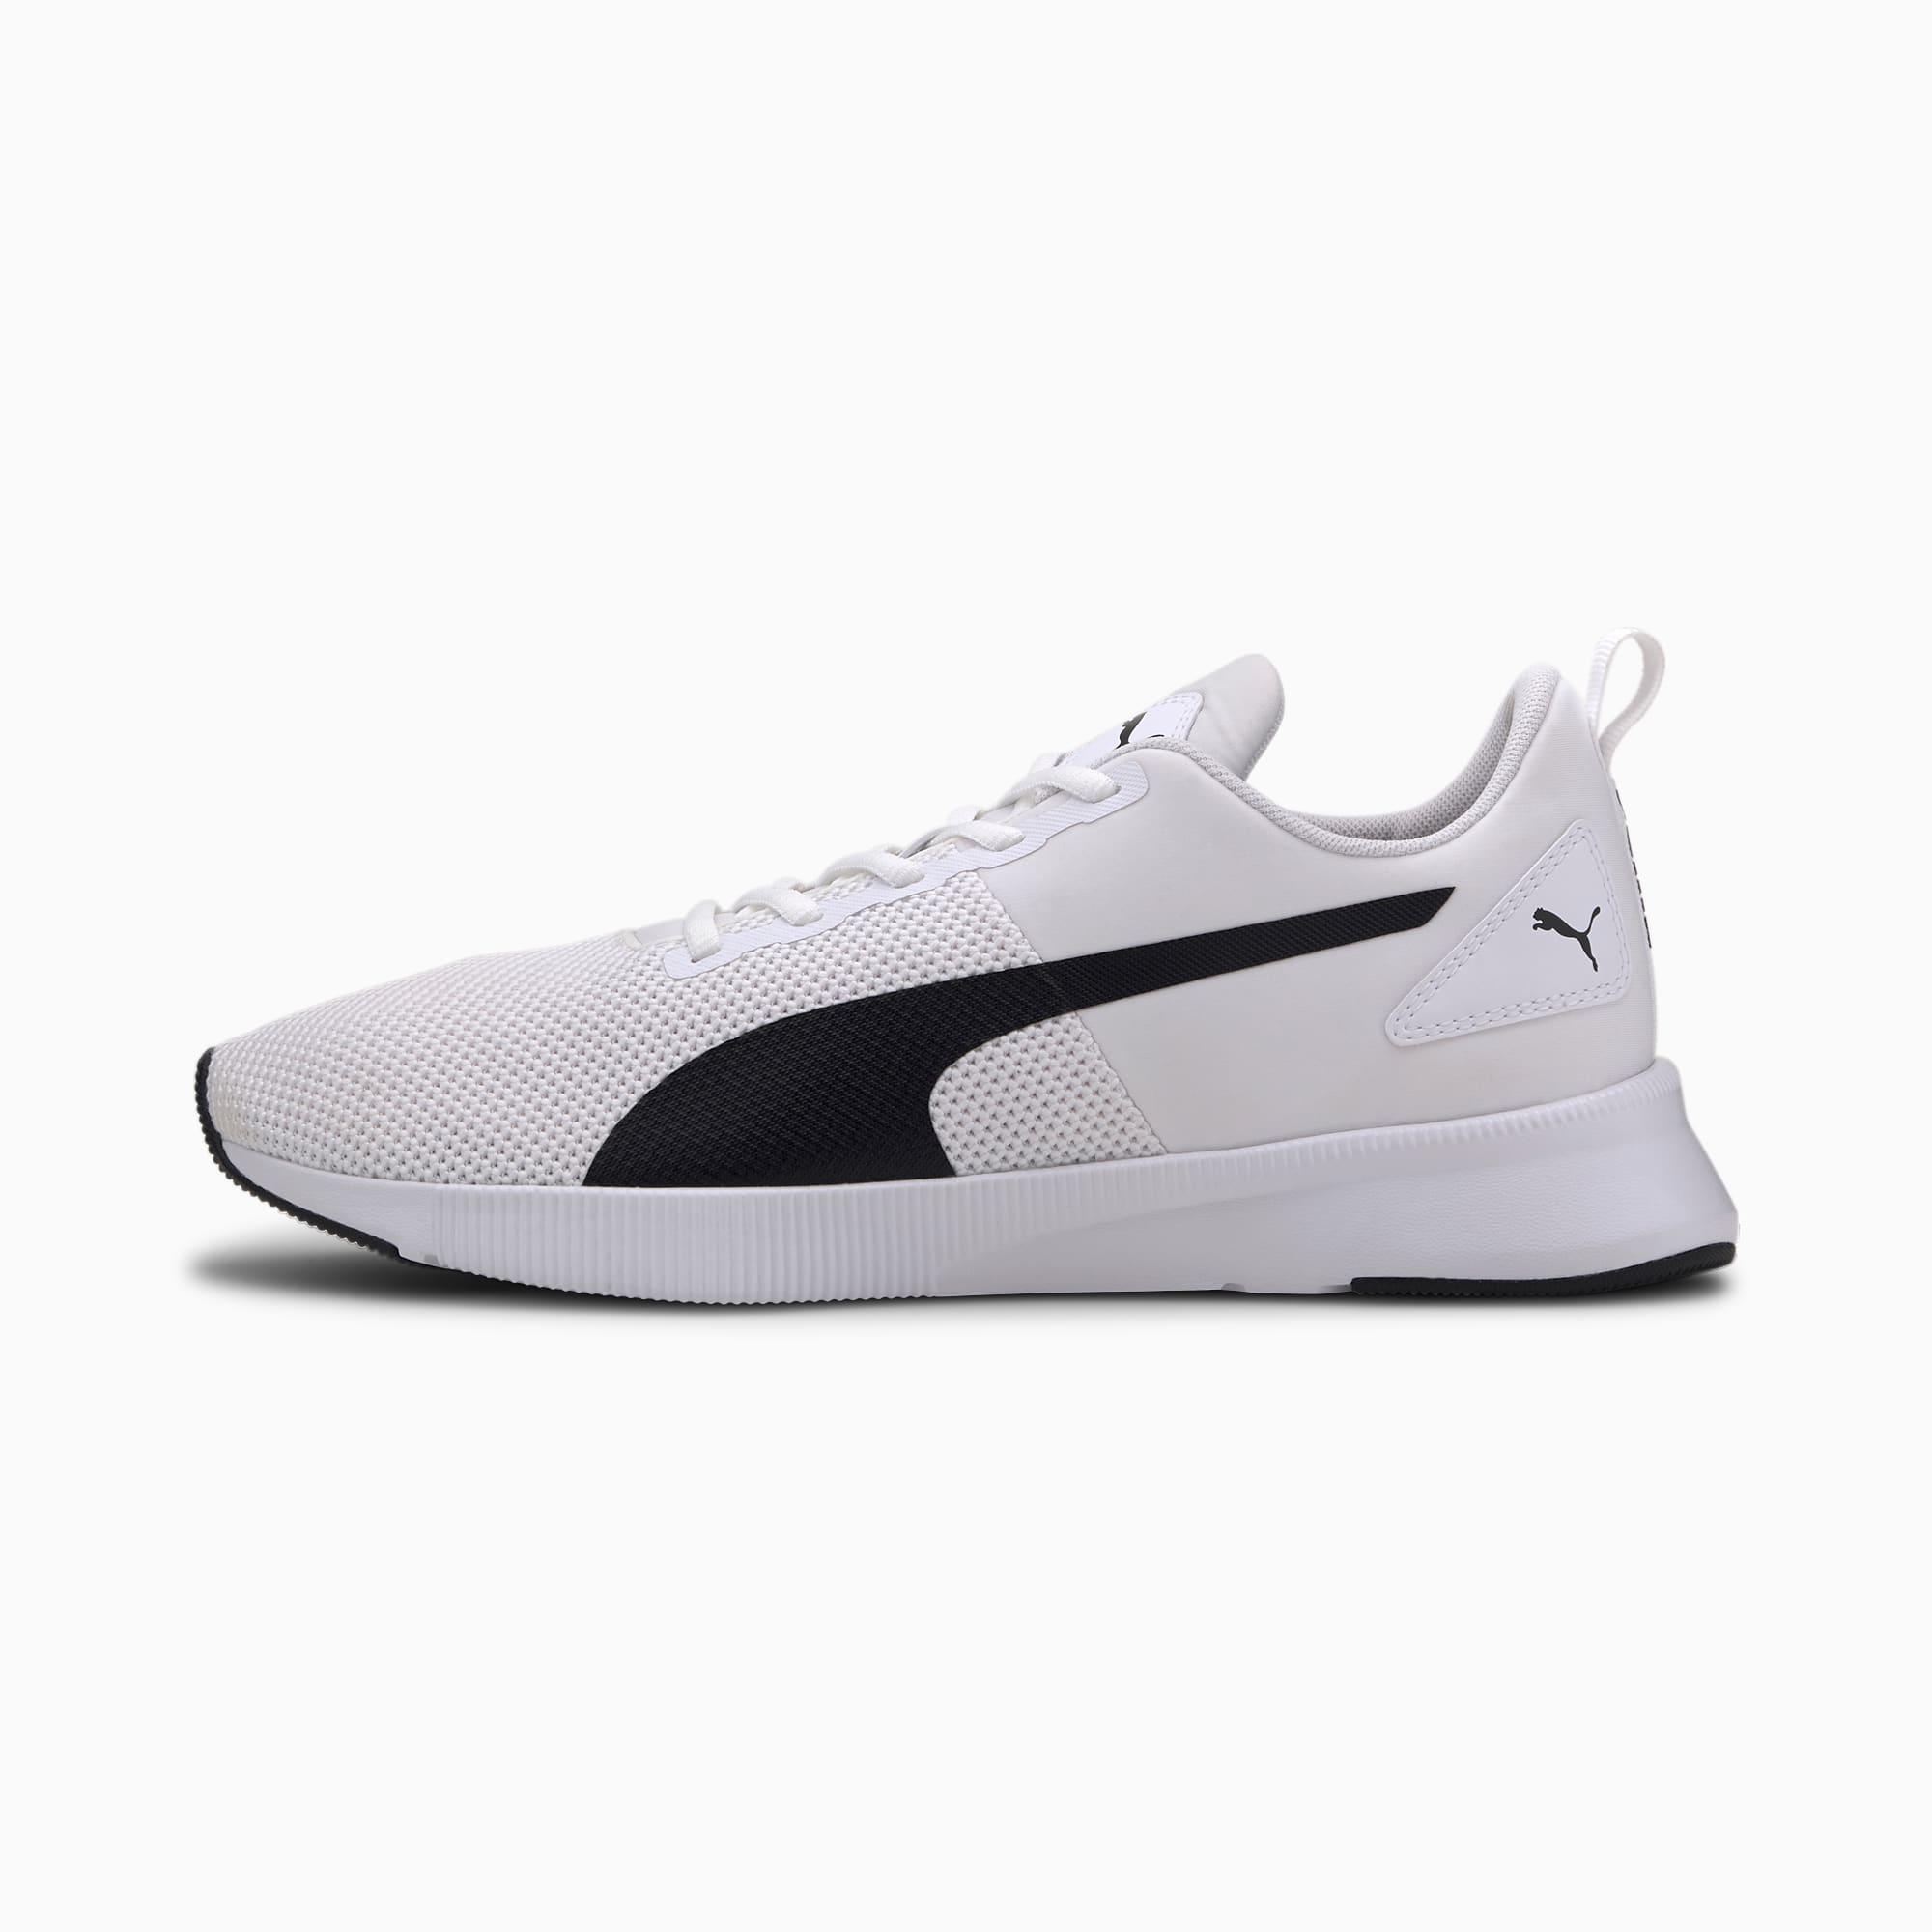 PUMA Chaussure de course Flyer Runner, Blanc/Noir, Taille 42.5, Chaussures